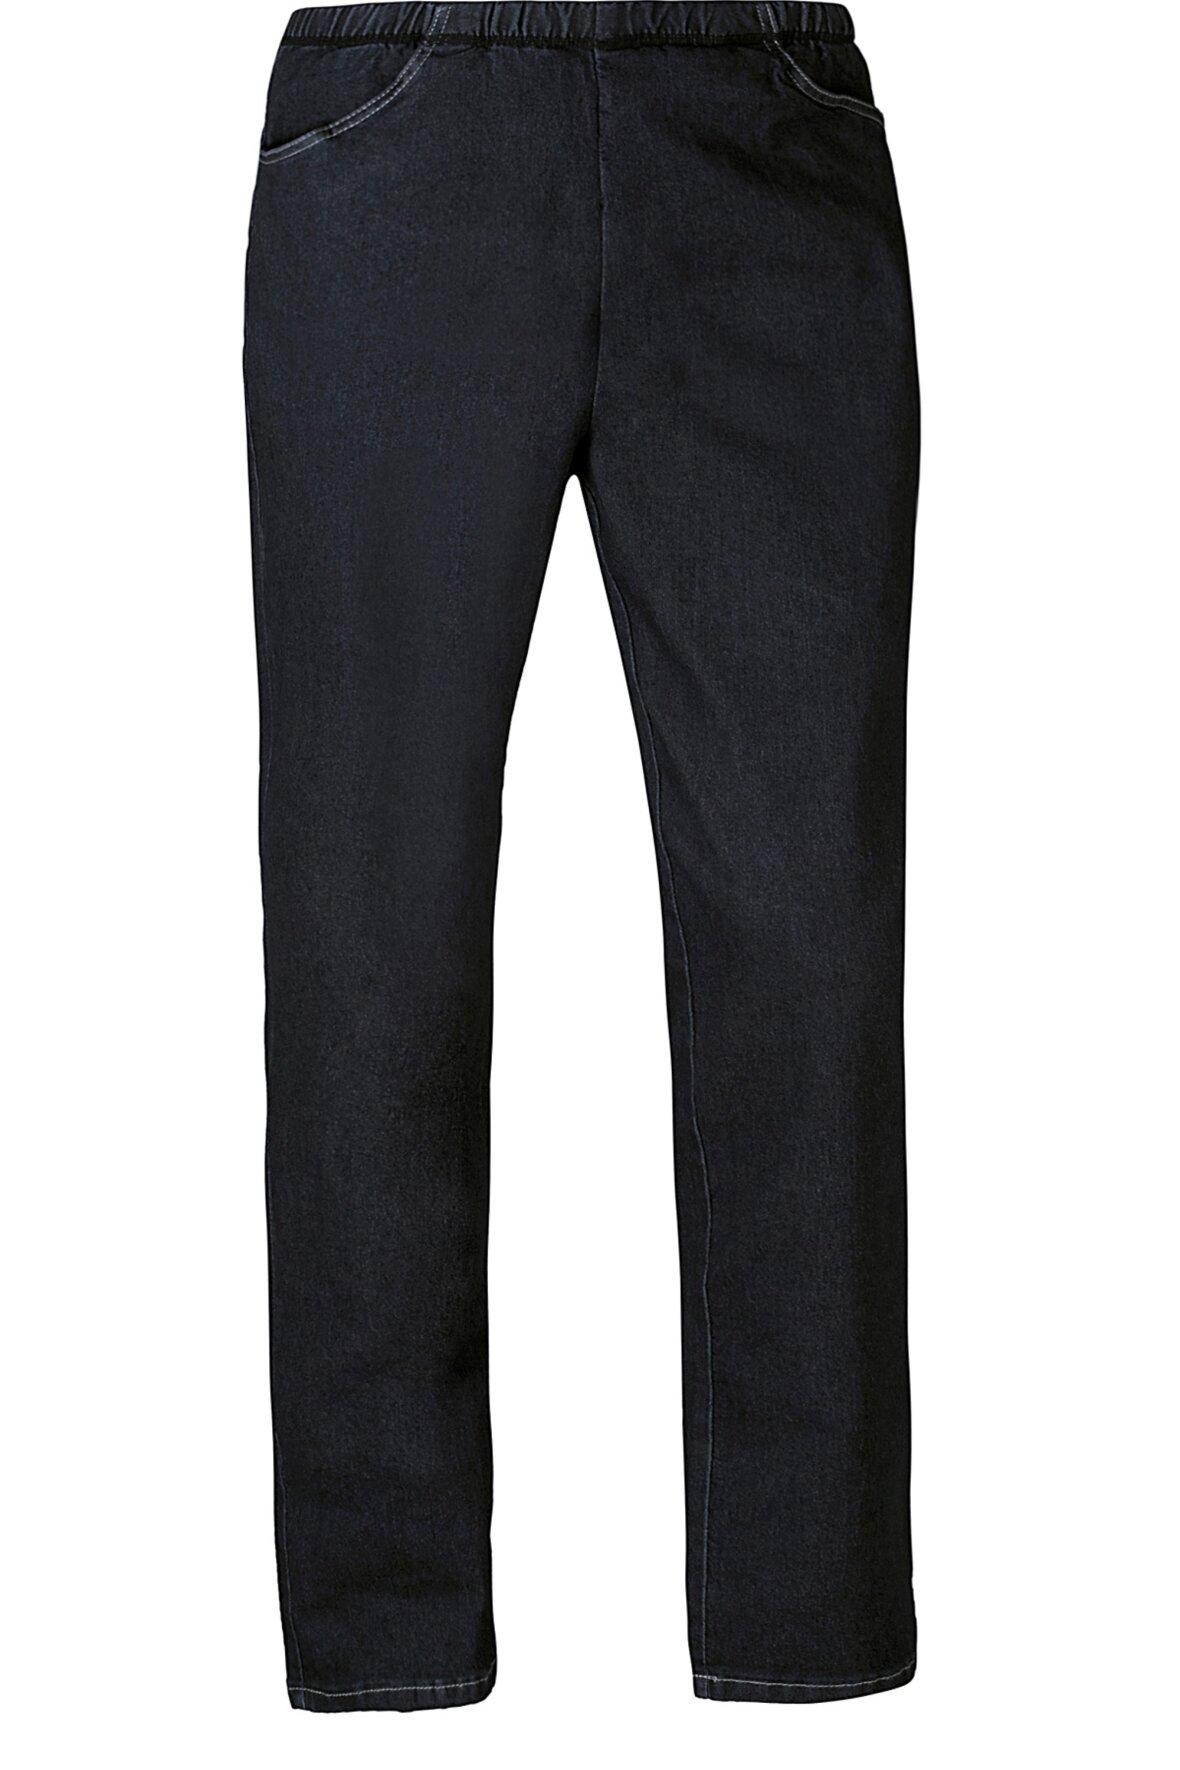 Zhenzi Jazzy Relaxed Fit jeans Jeans med elastik i livet